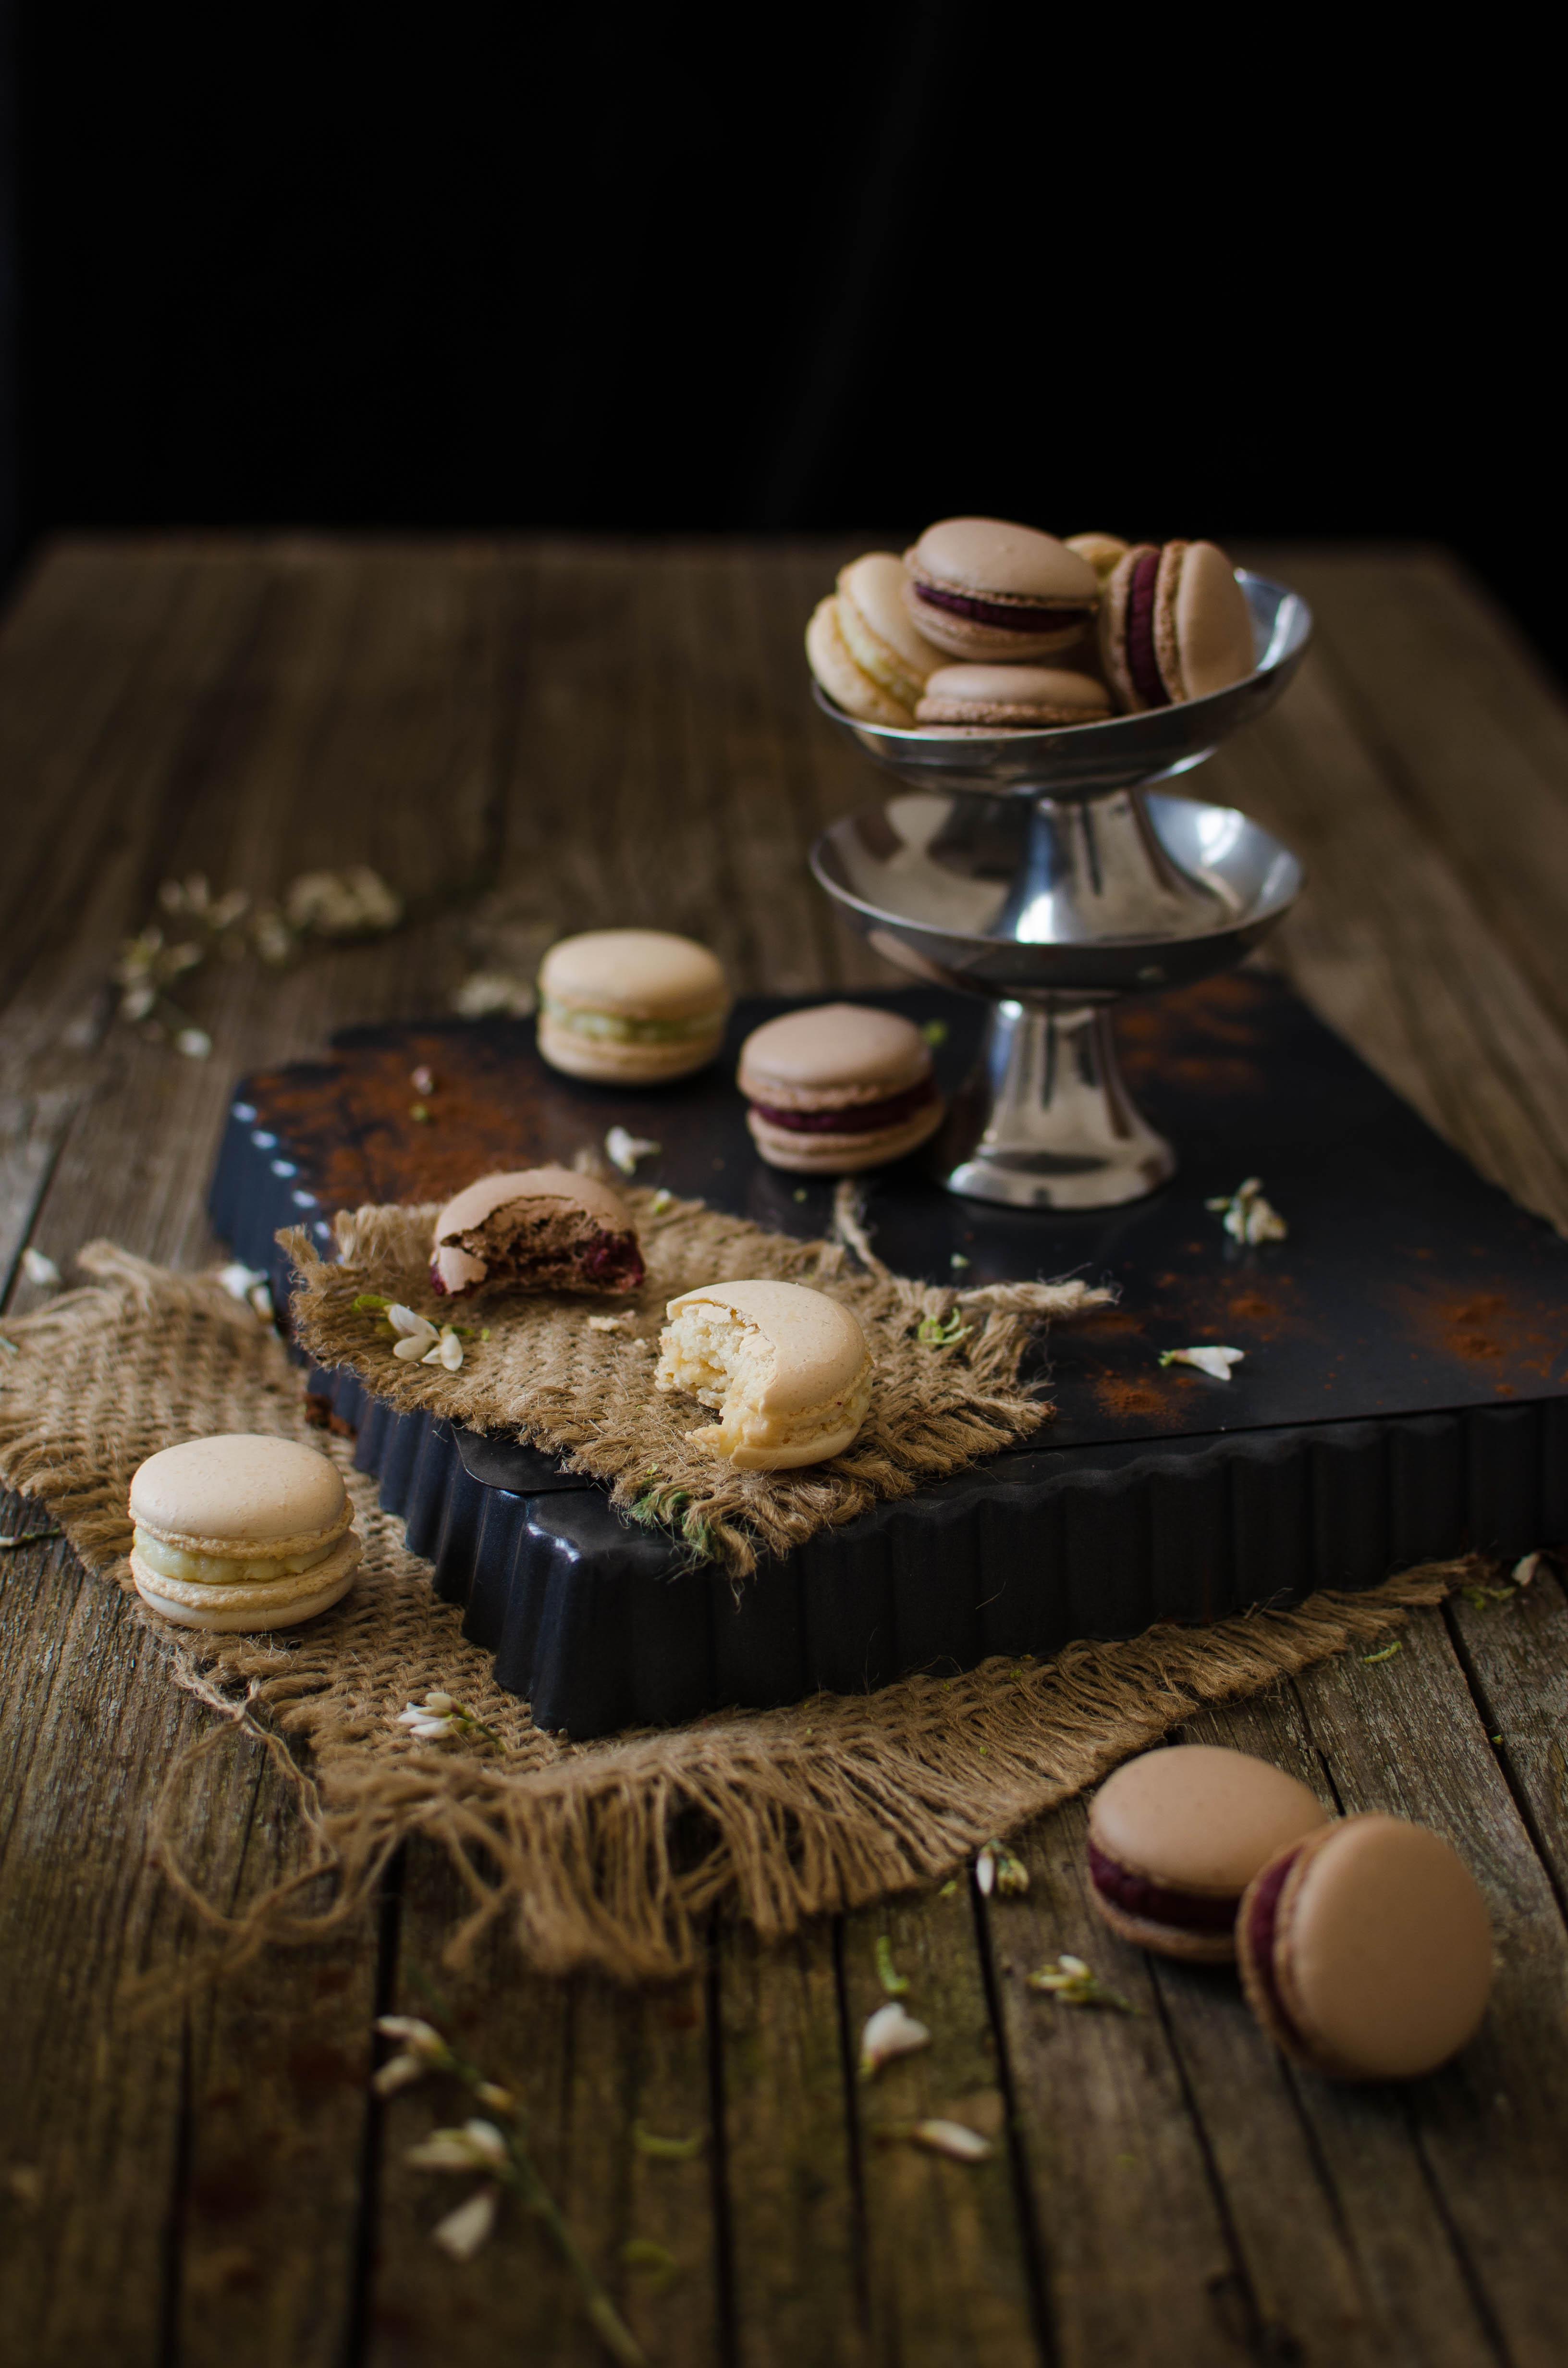 macarons_mtch1 Macarons al cioccolato con barbabietola, lime, cocco, arancia